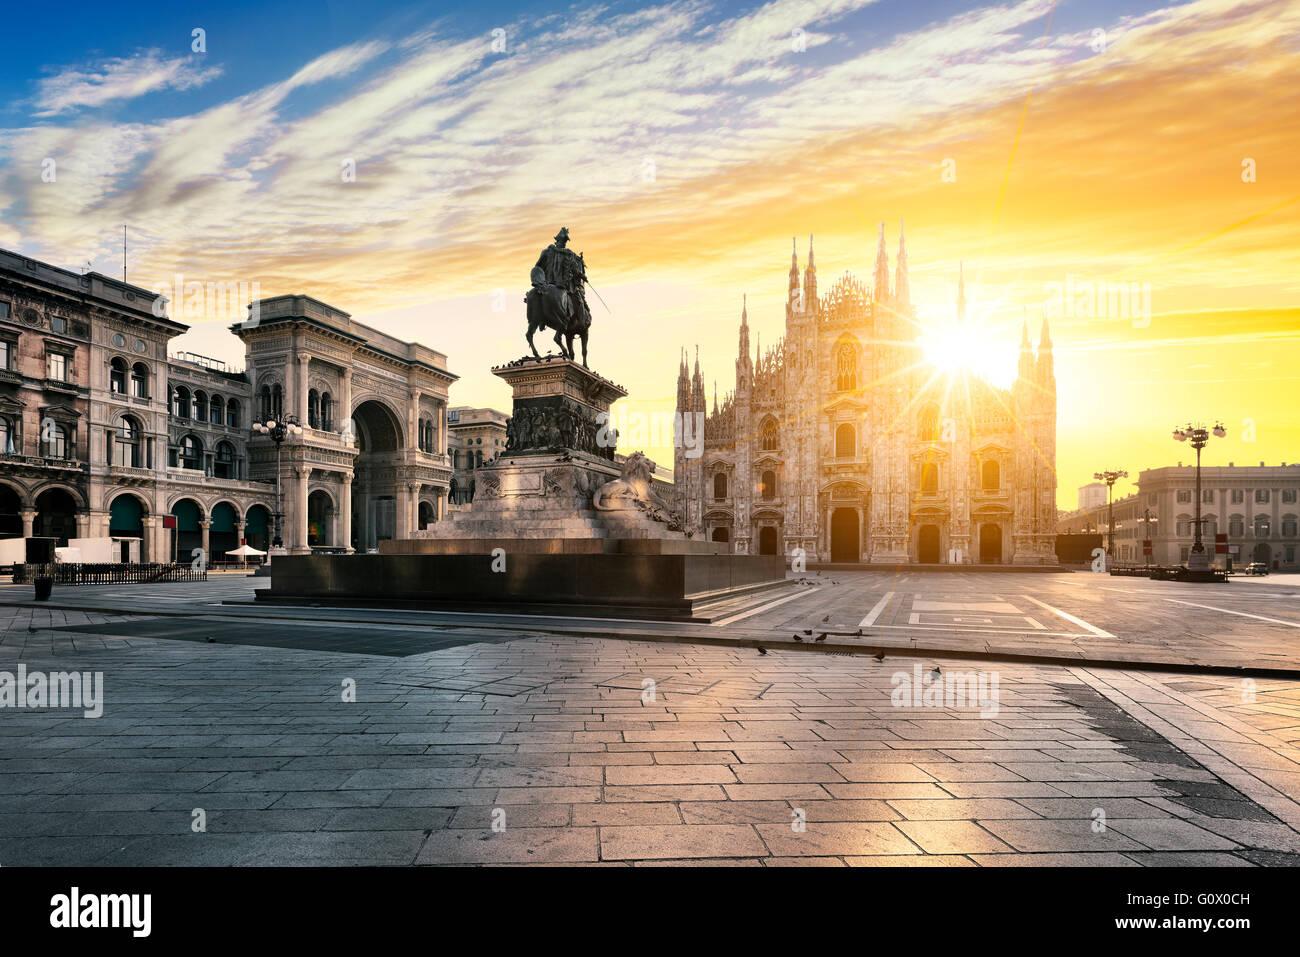 Duomo au lever du soleil, Milan, Italie, Europe. Photo Stock